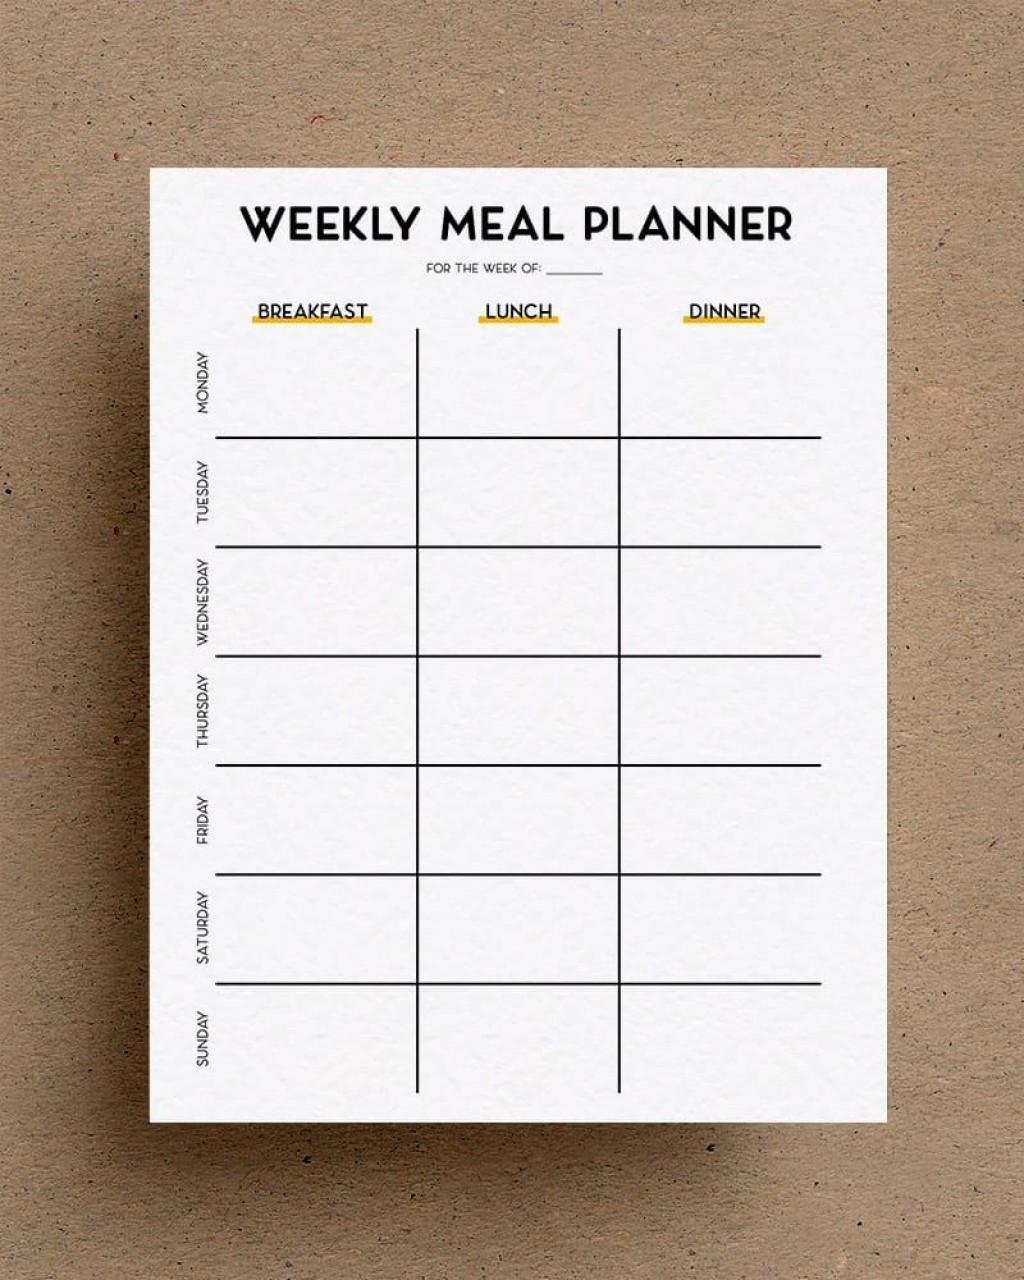 003 Excellent Eating Plan Template Pdf High Definition  Food Safety Sample Keto Meal Gestational DiabeteLarge